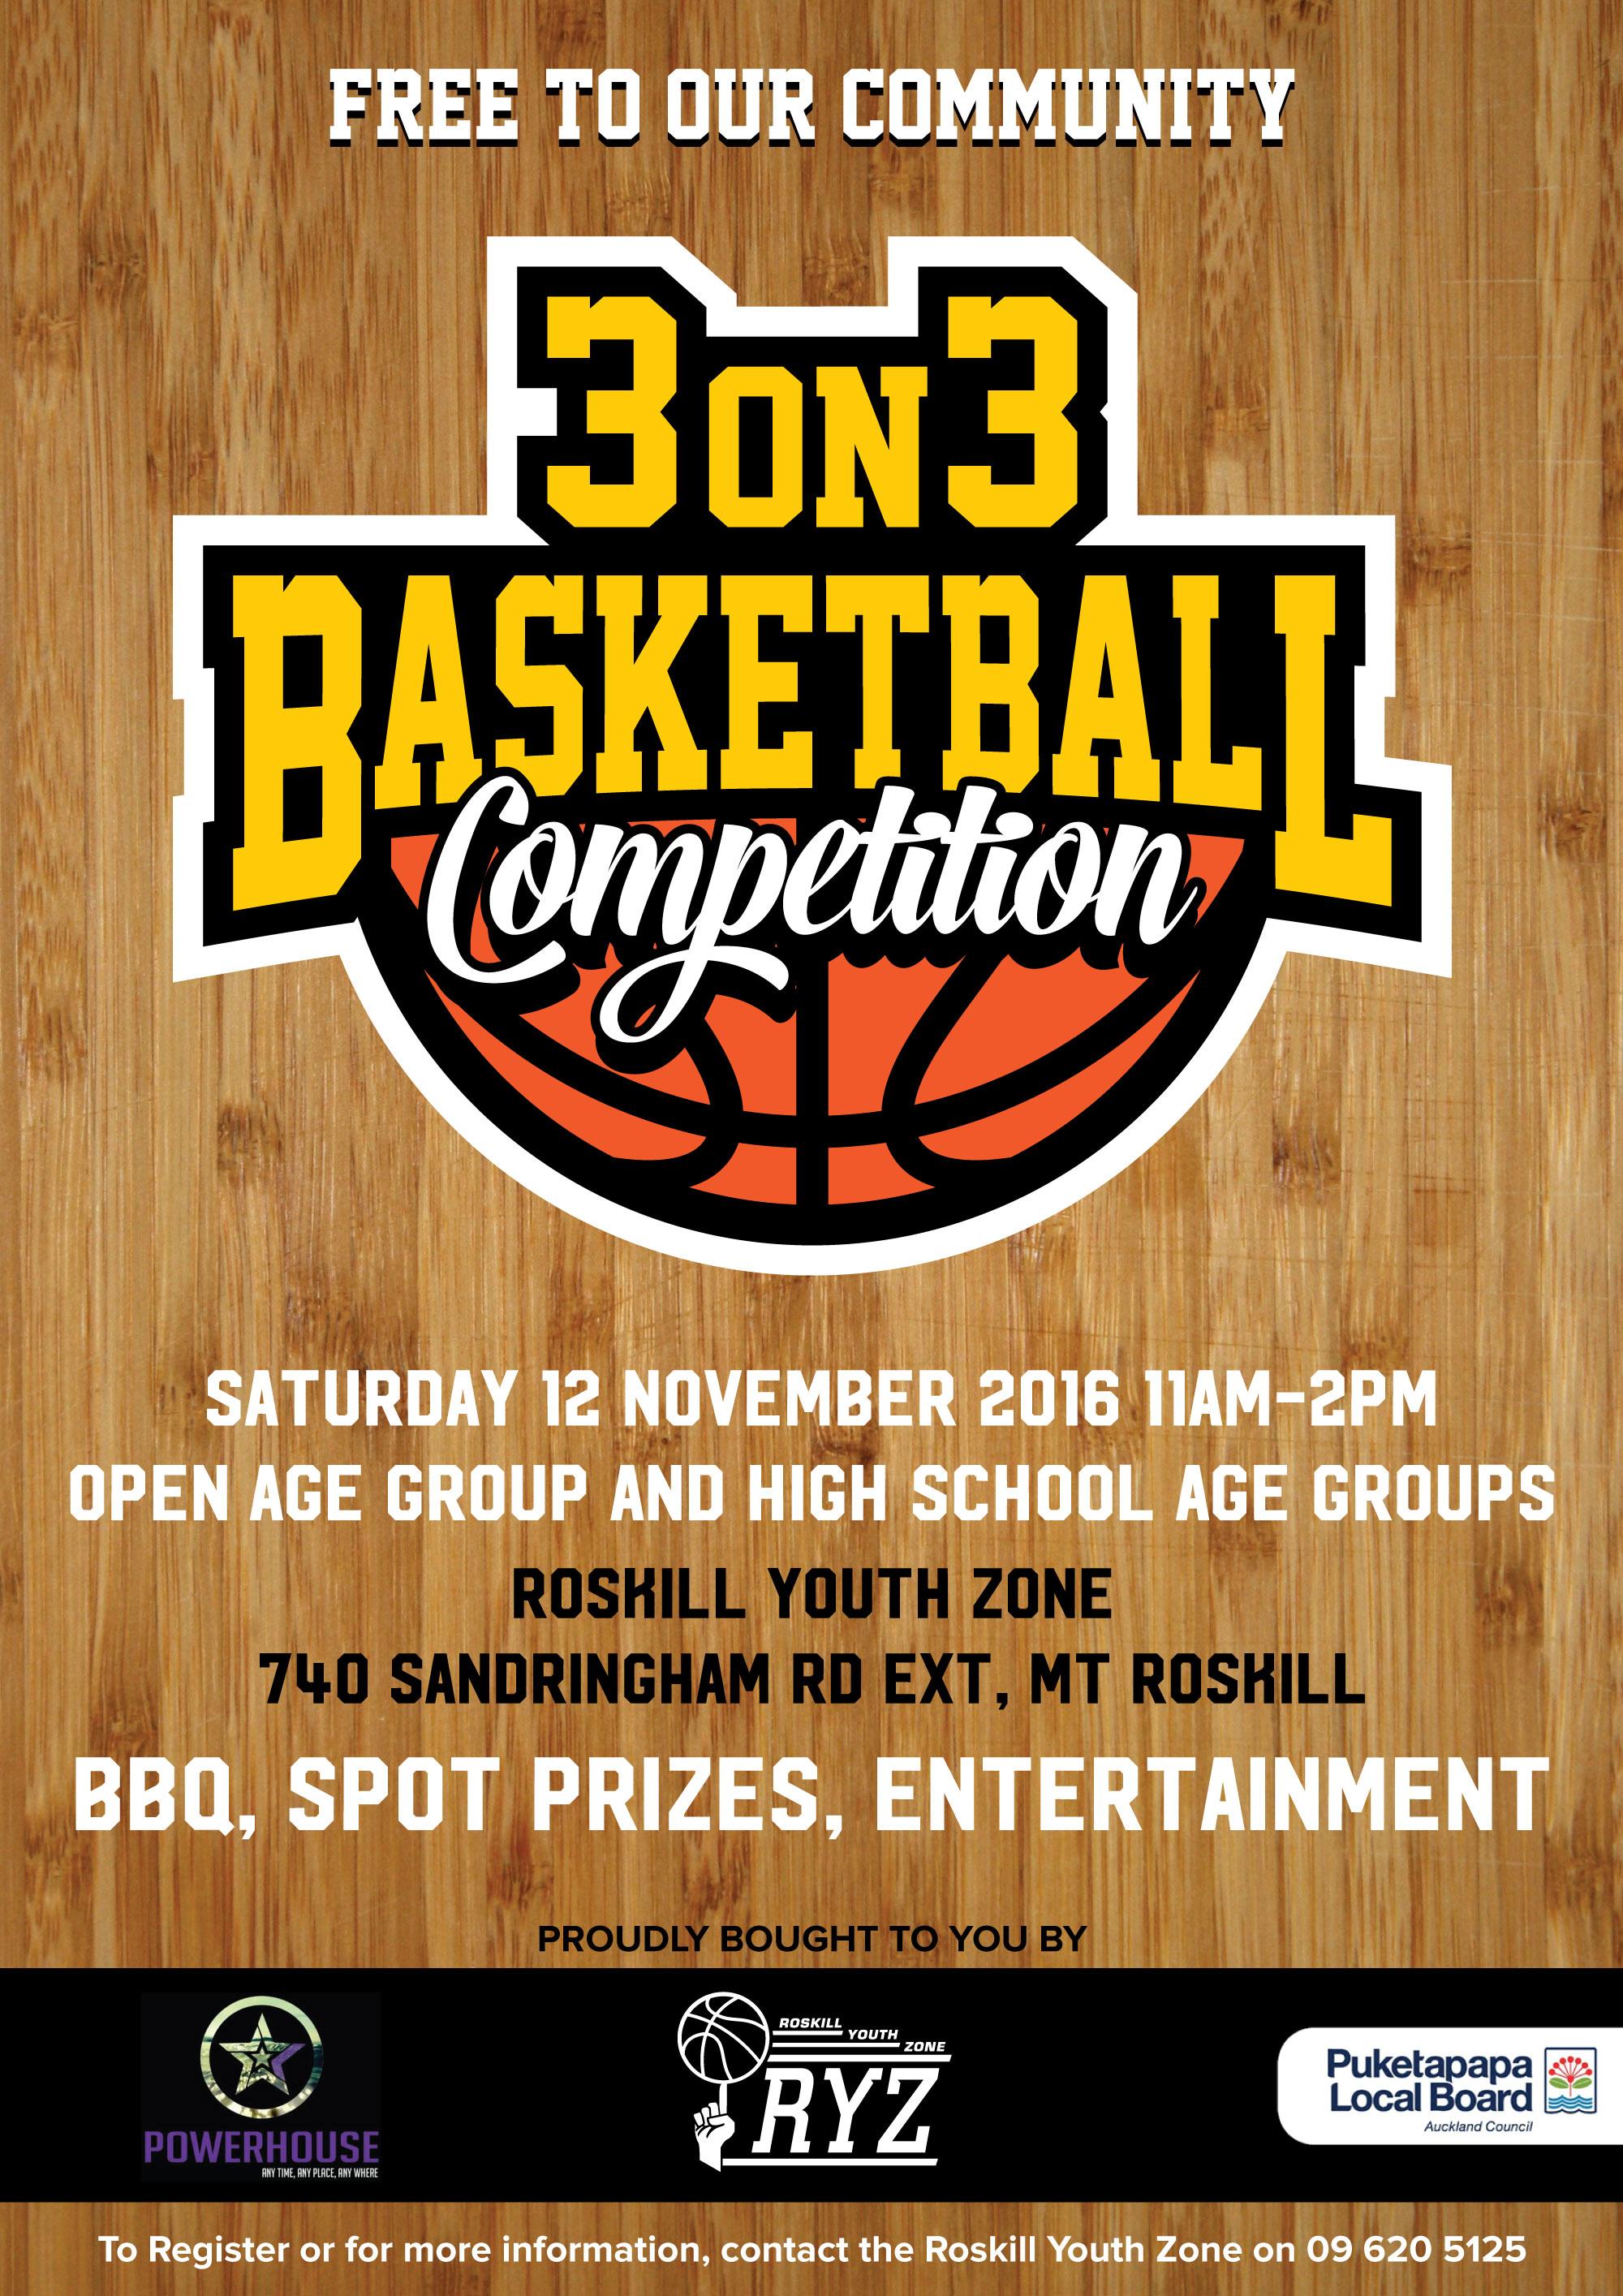 3on3-Basketball.jpg